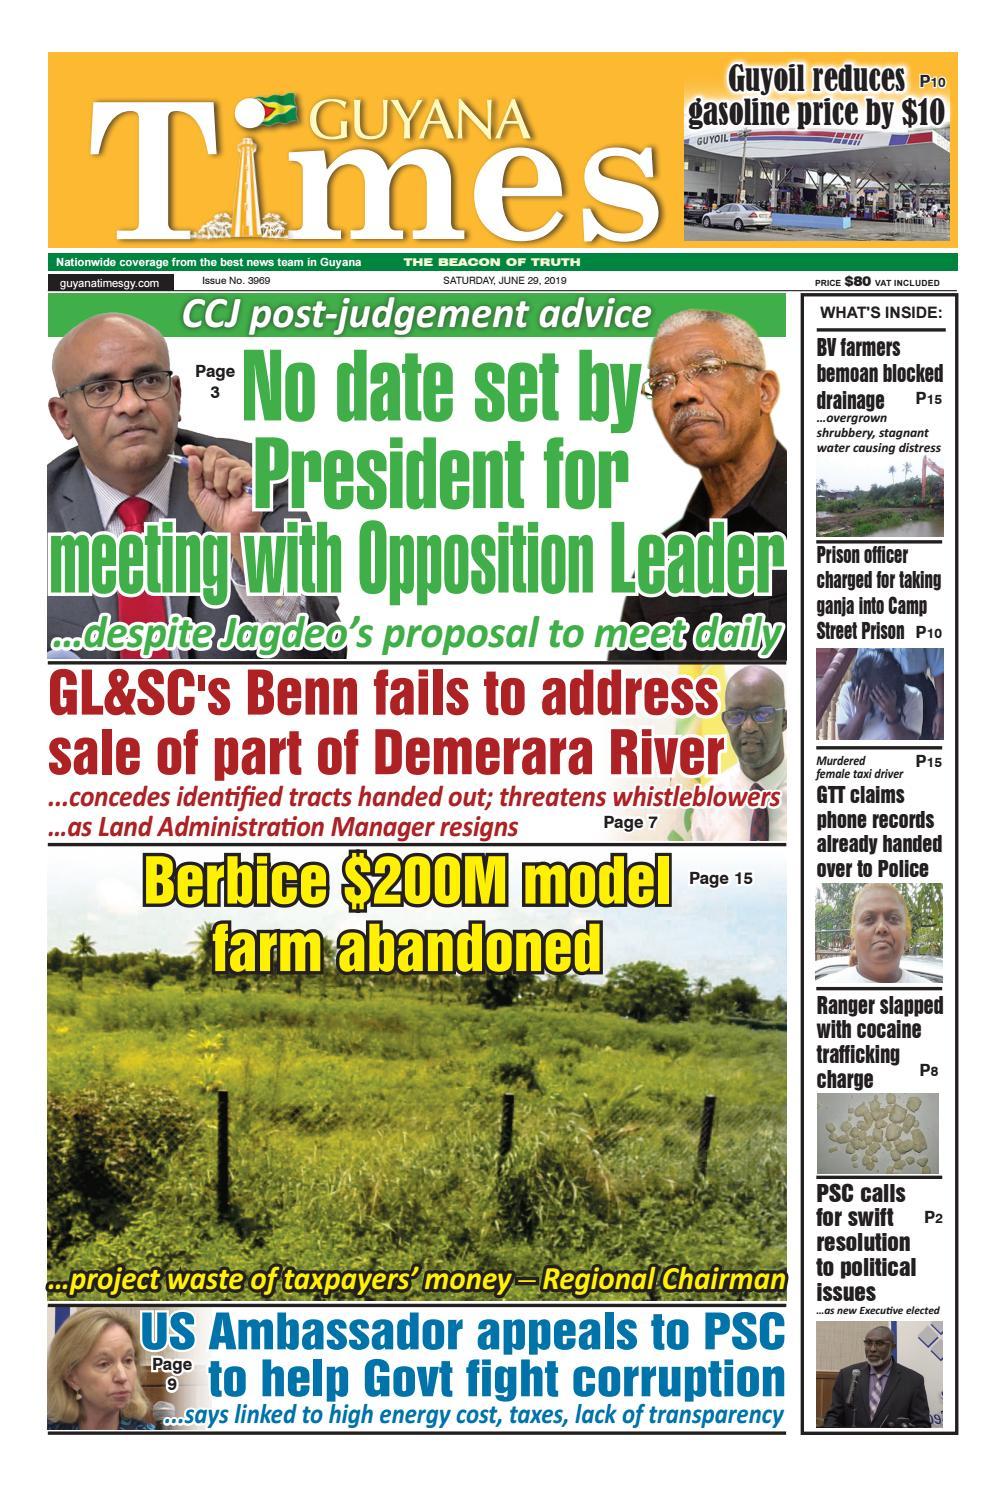 Guyana Times Saturday June 29, 2019 by Gytimes - issuu